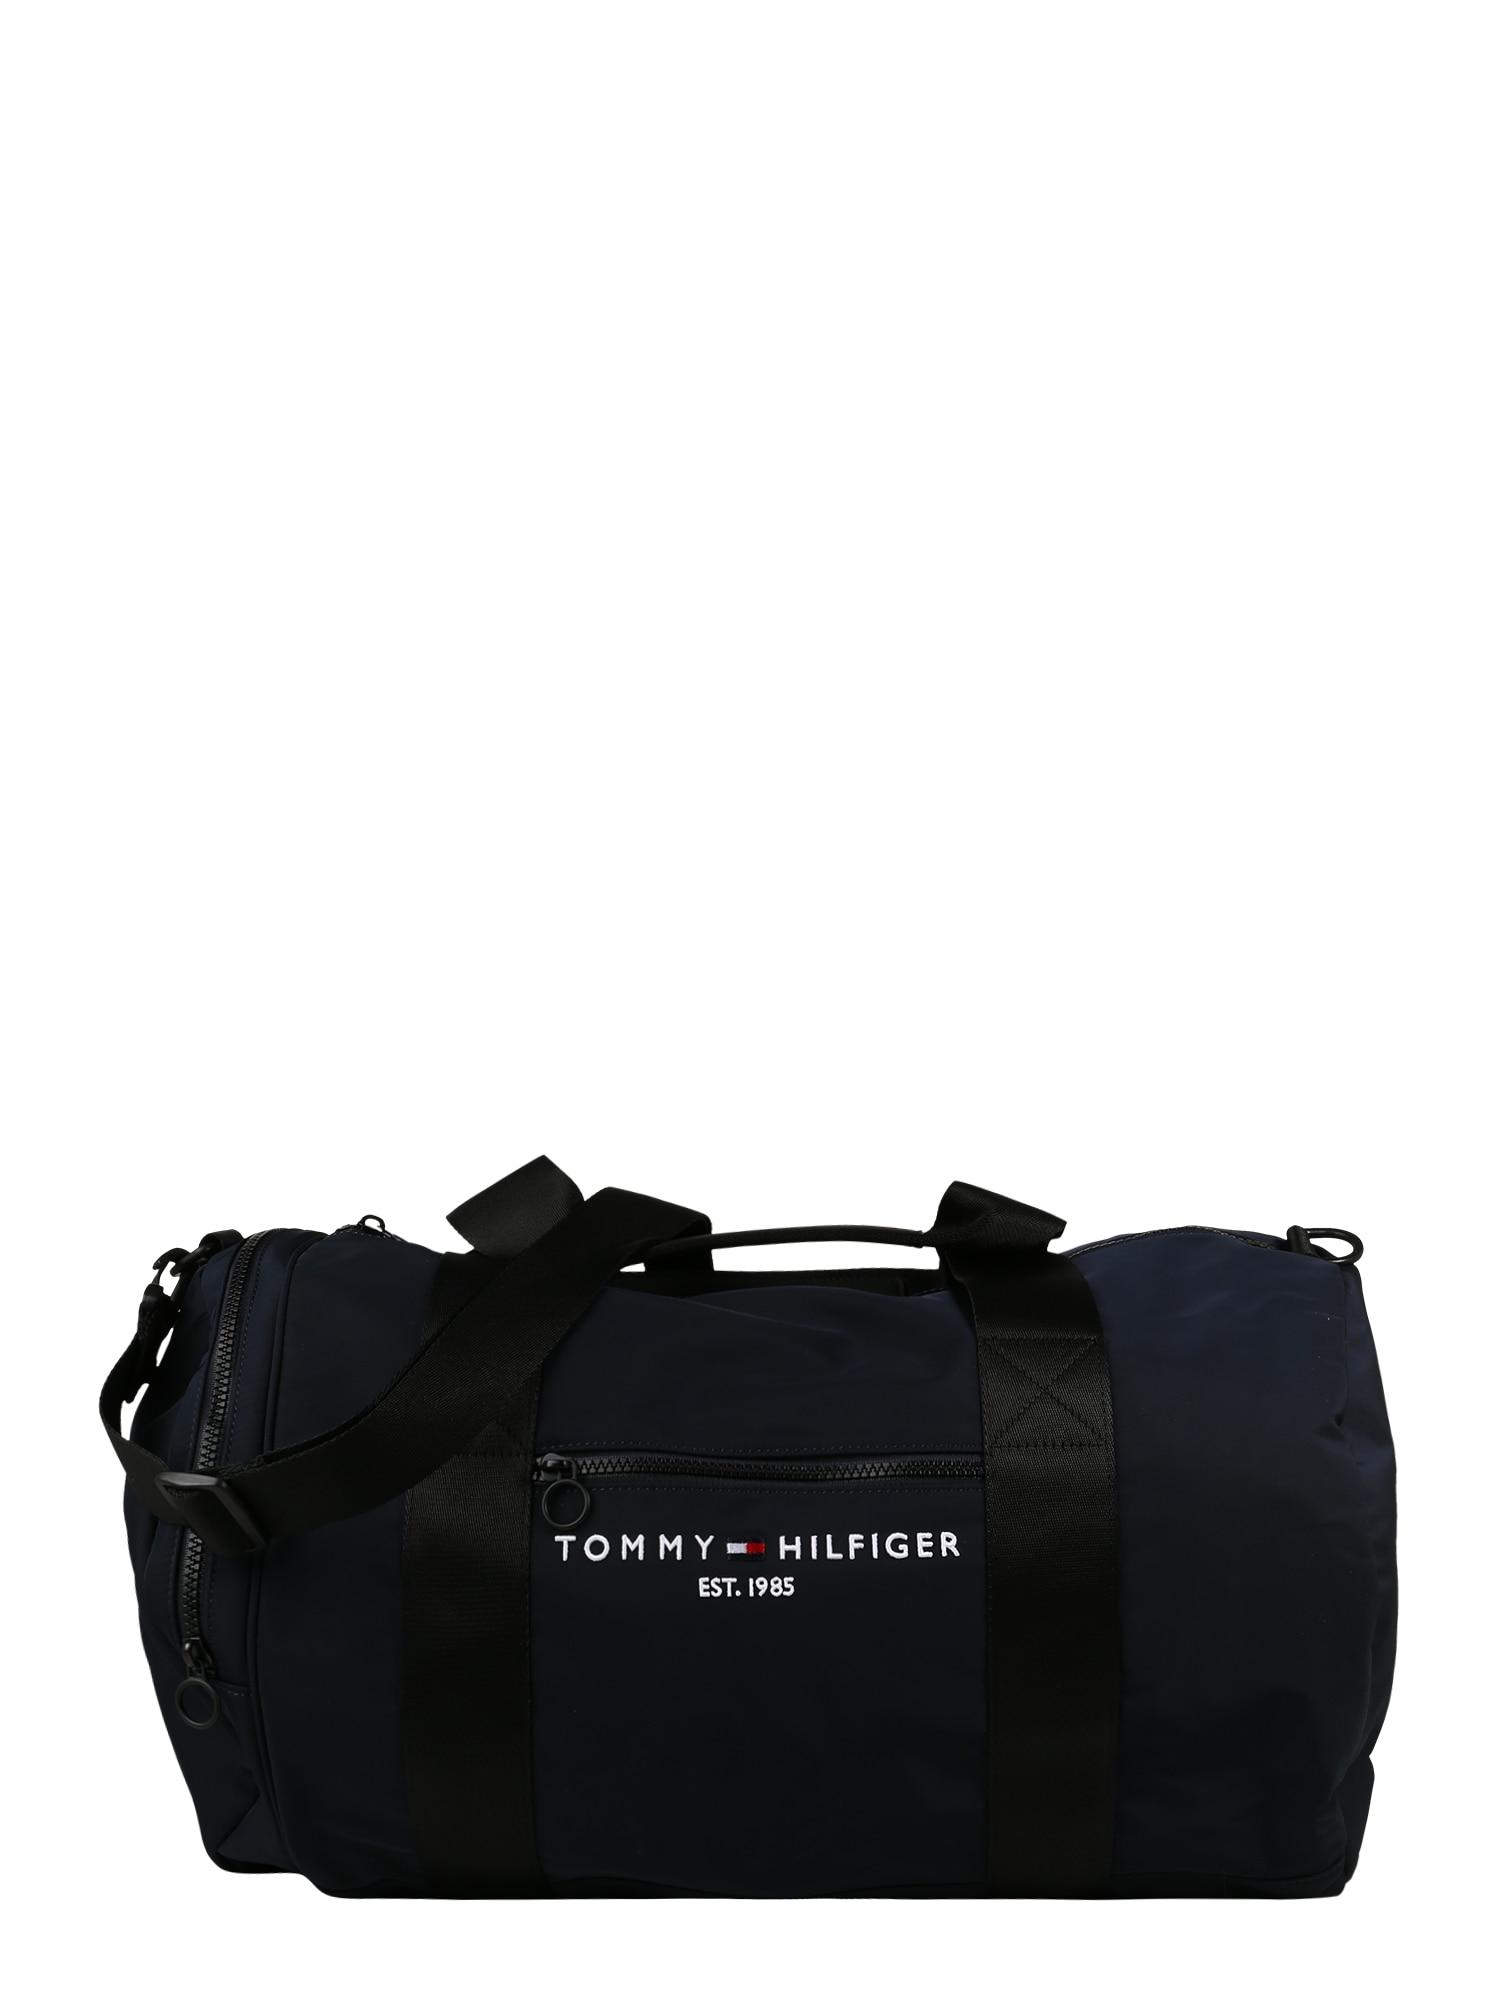 TOMMY HILFIGER Kelioninis krepšys